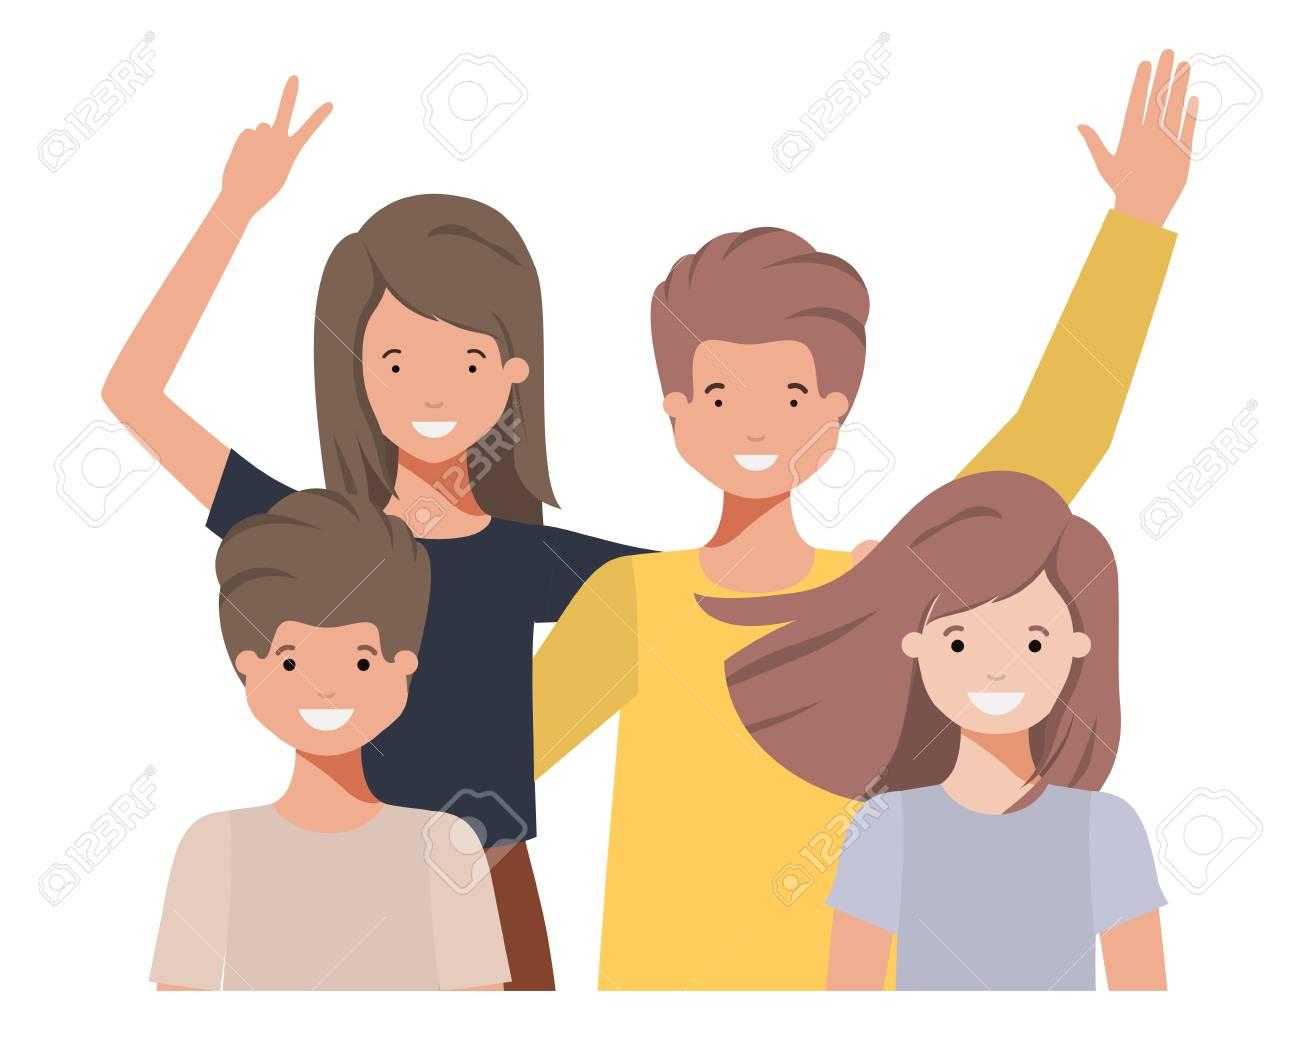 family waving avatar character vector illustration design - 110022779